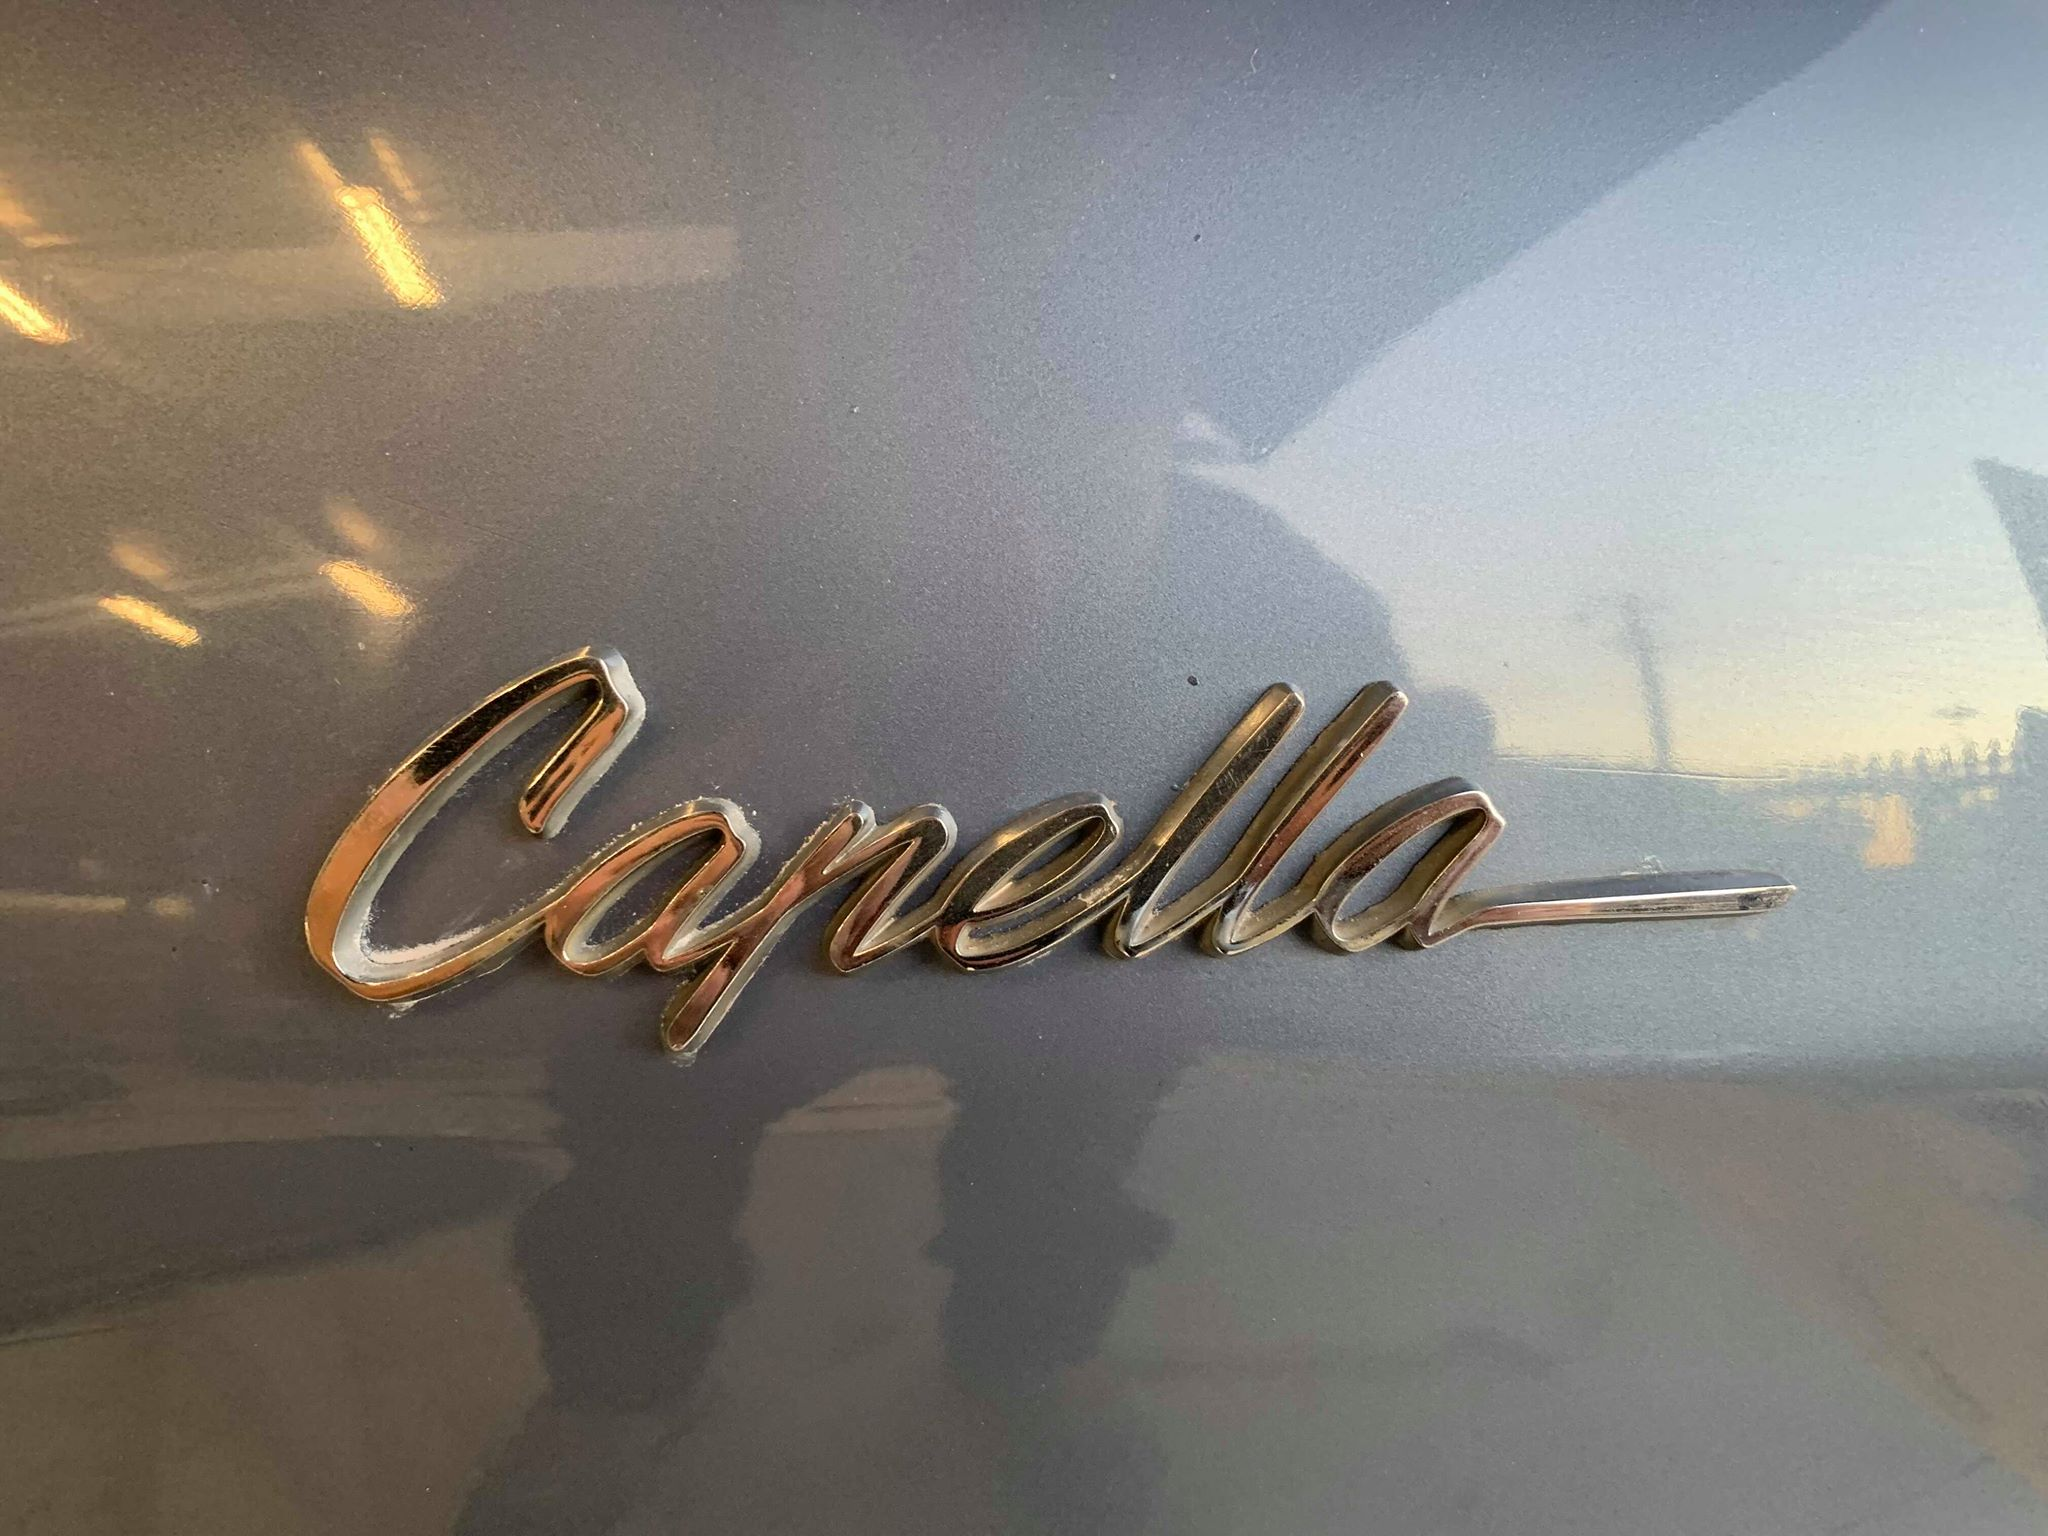 Mazda Capella - https://www.newcastleprosound.com.au/wp-content/uploads/2019/07/67550904_484858235580989_7806273811199819776_n.jpg